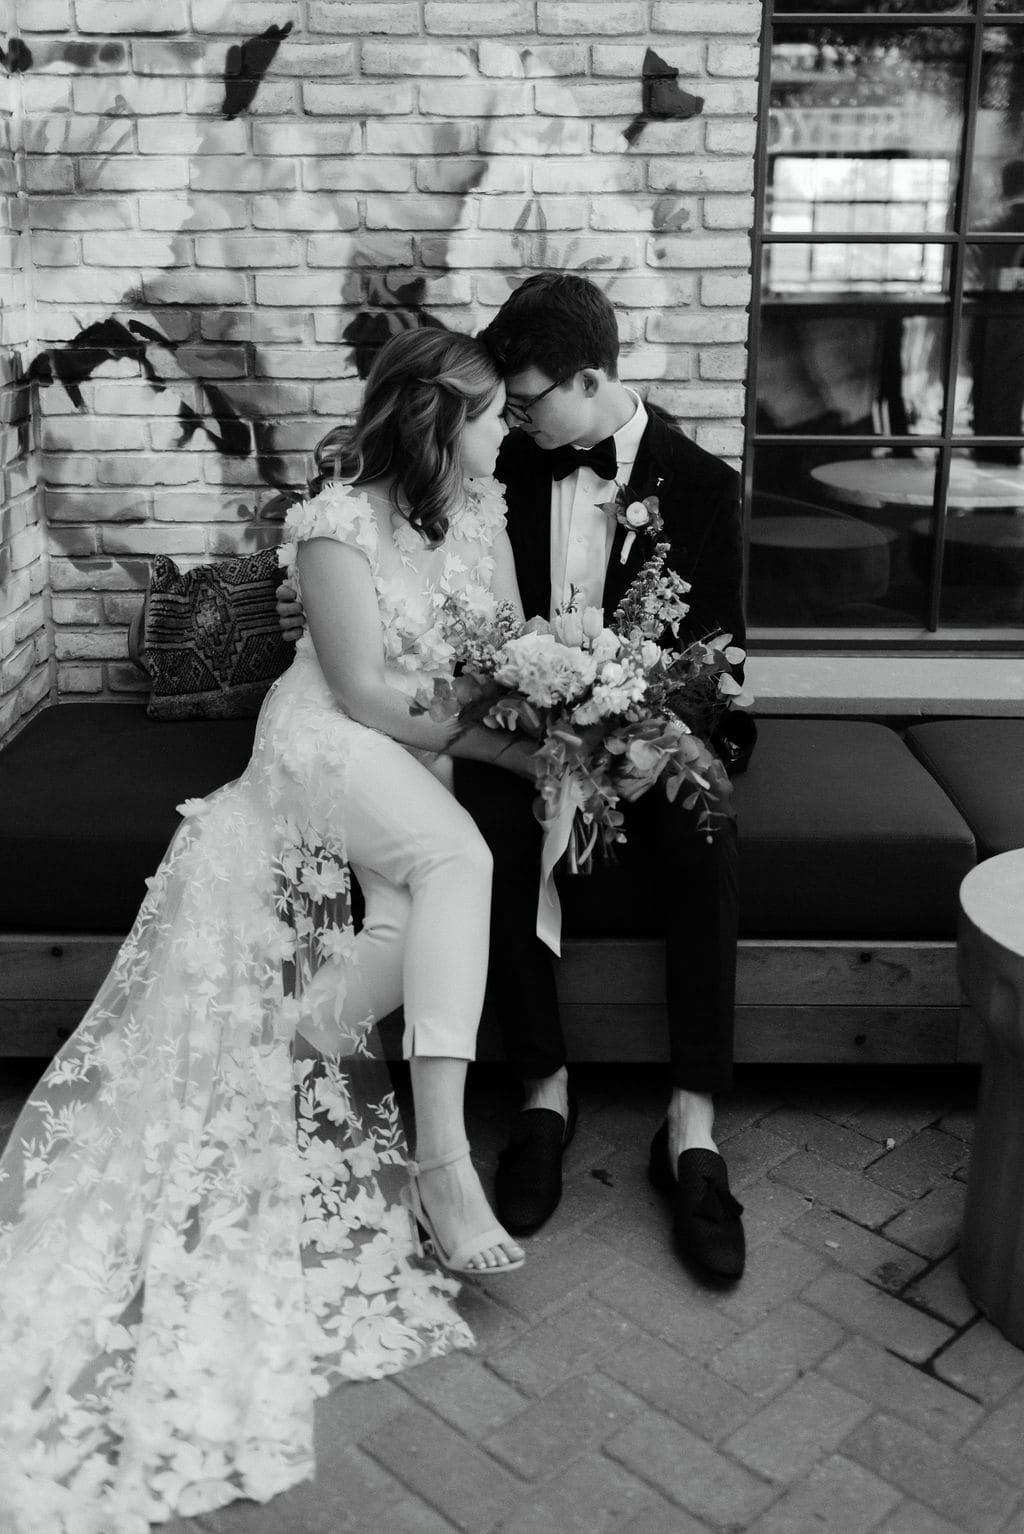 Bride and Groom Portraits at Denver Colorado Elopement at the Ramble Hotel